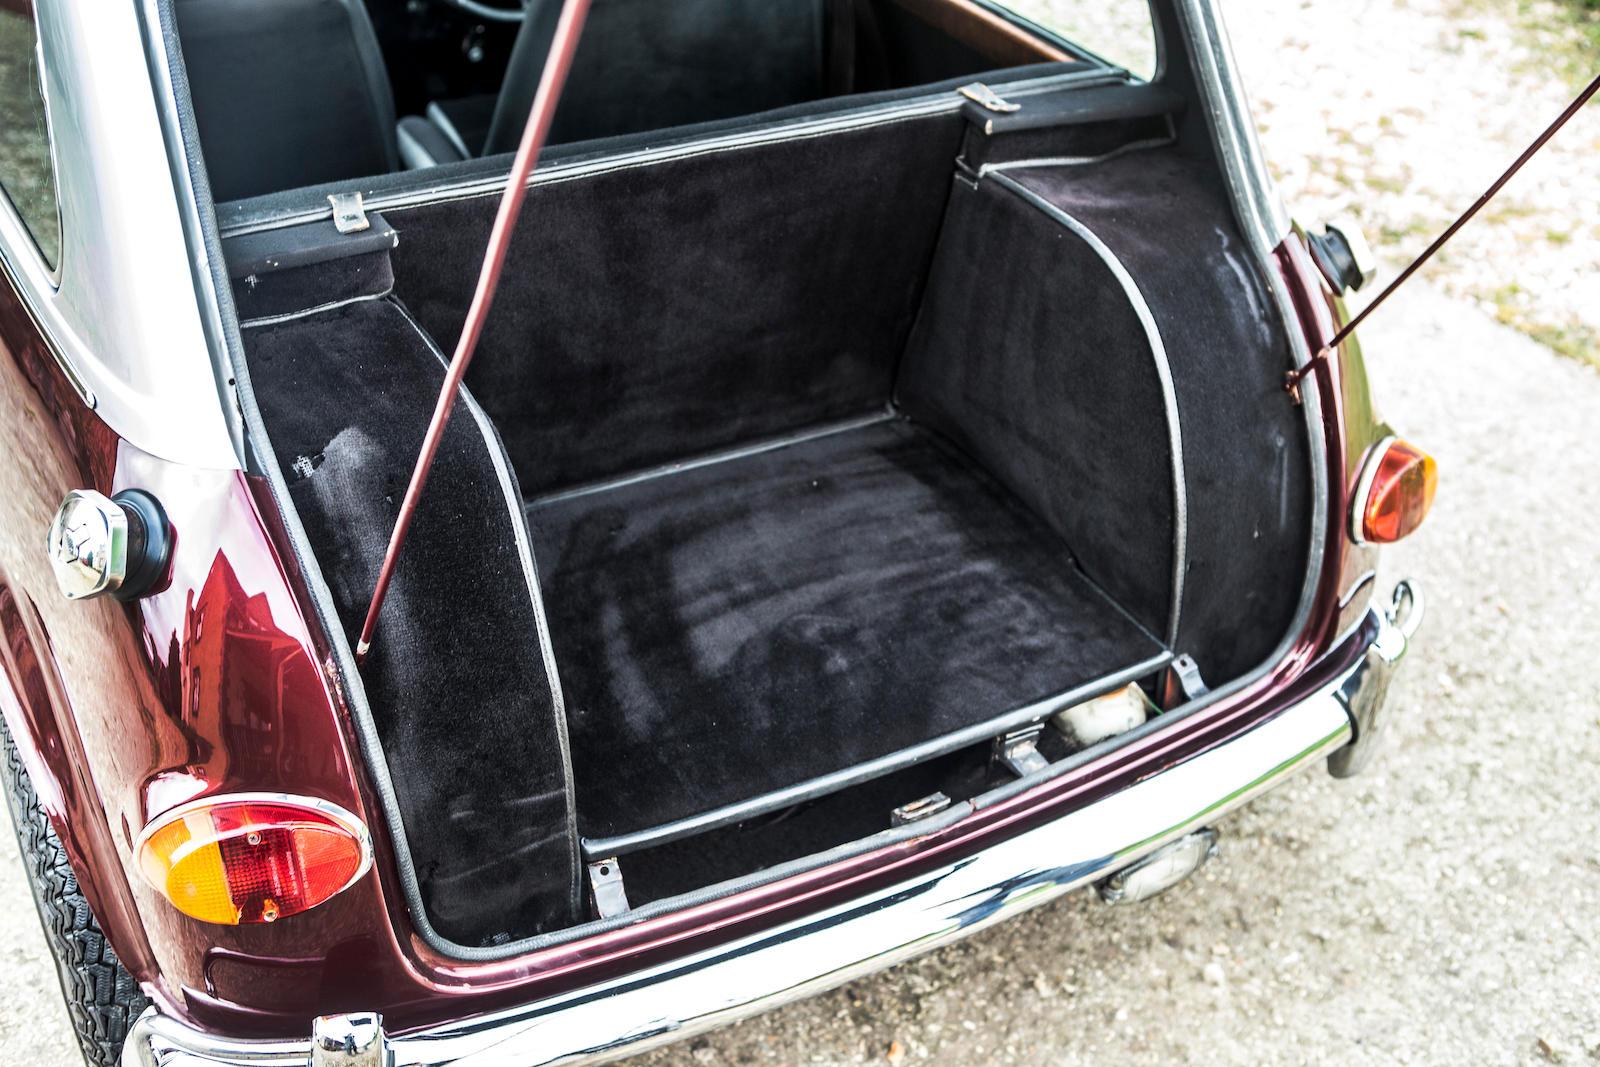 Ringo Starr's 1966 Austin Mini Cooper S custom trunk